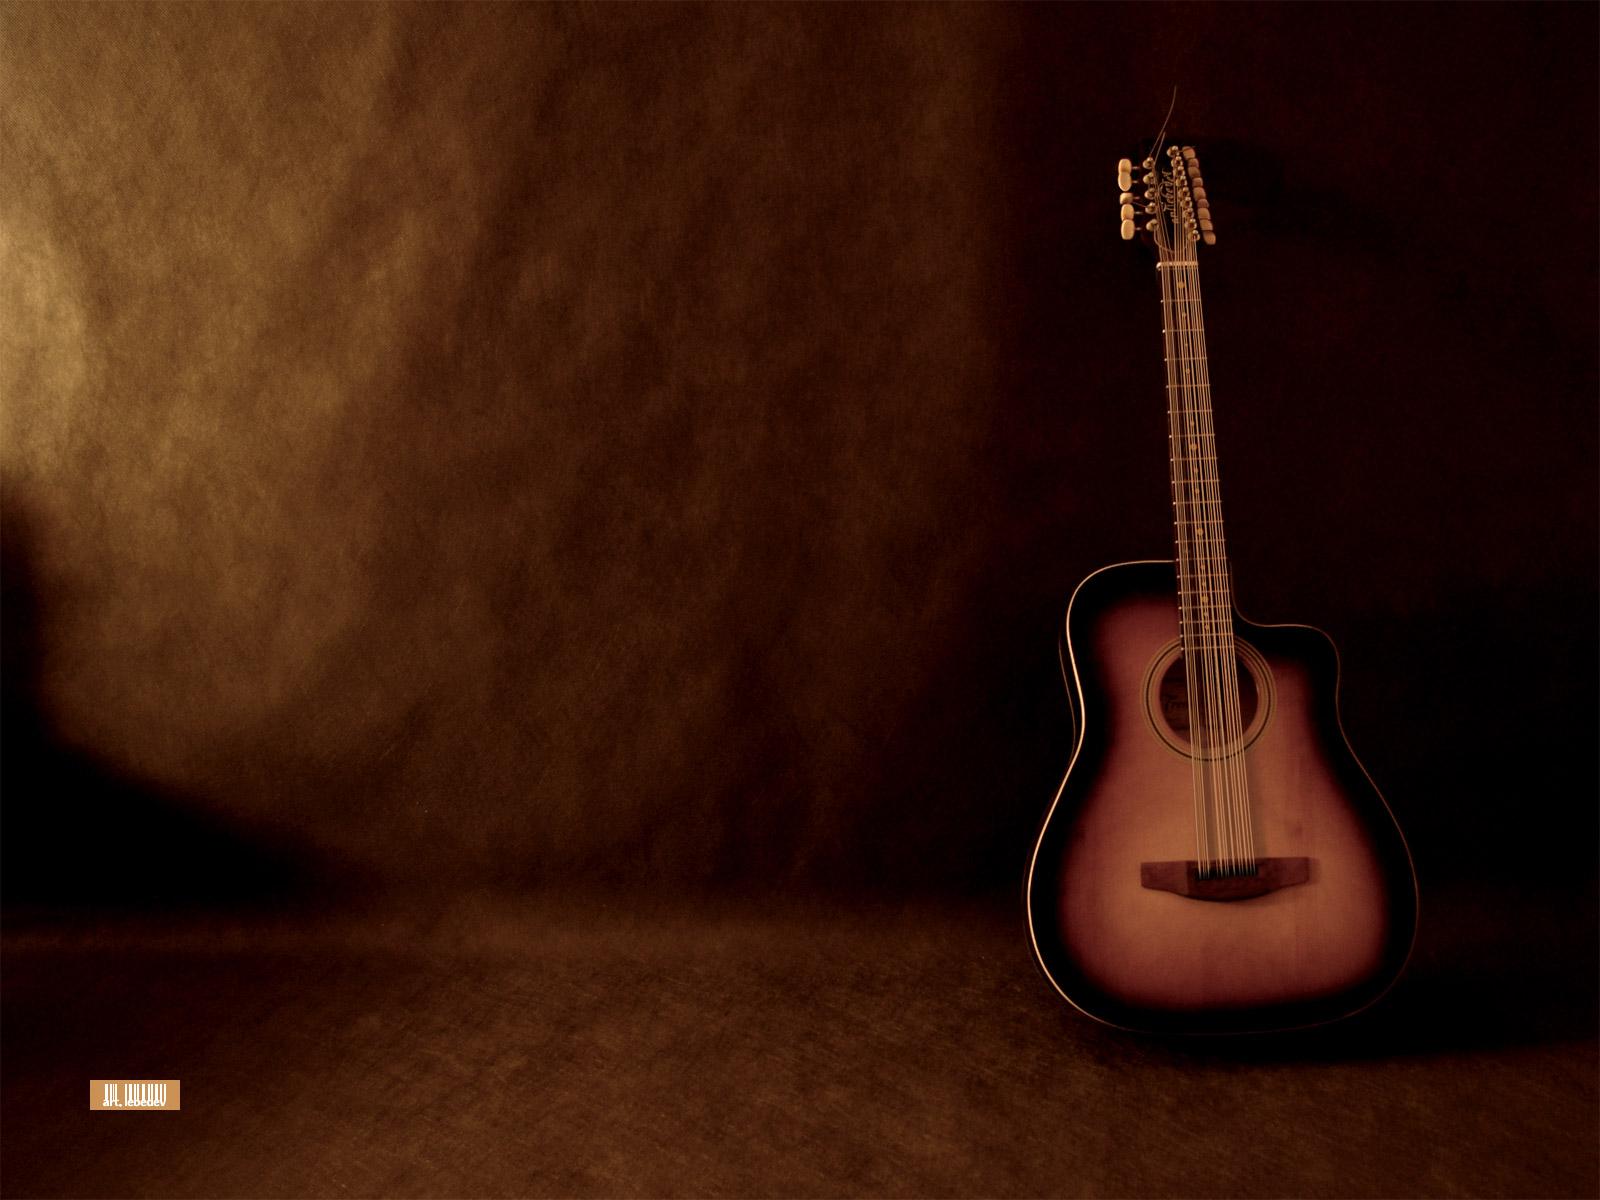 Music Quotes Wallpaper Guitar Guitar Wallpaper Hd Desktop 3996 Wallpaper Walldiskpaper